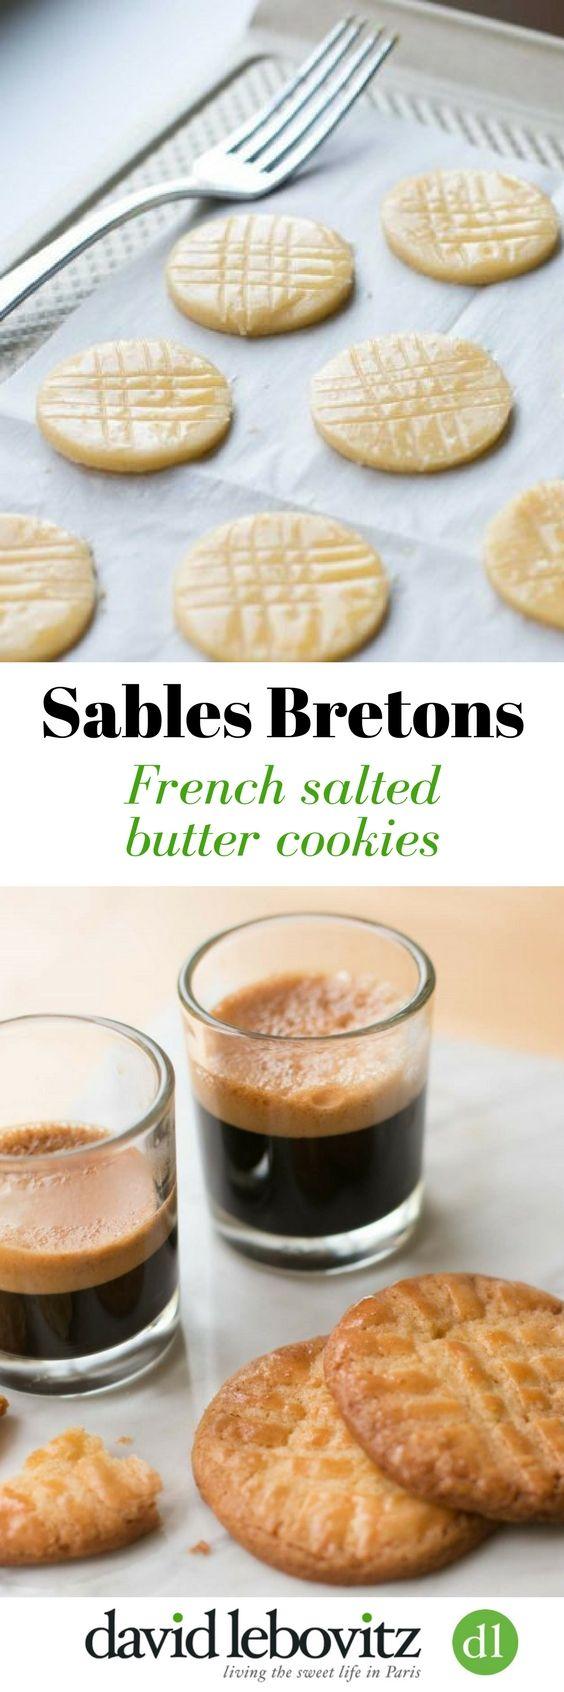 sables breton